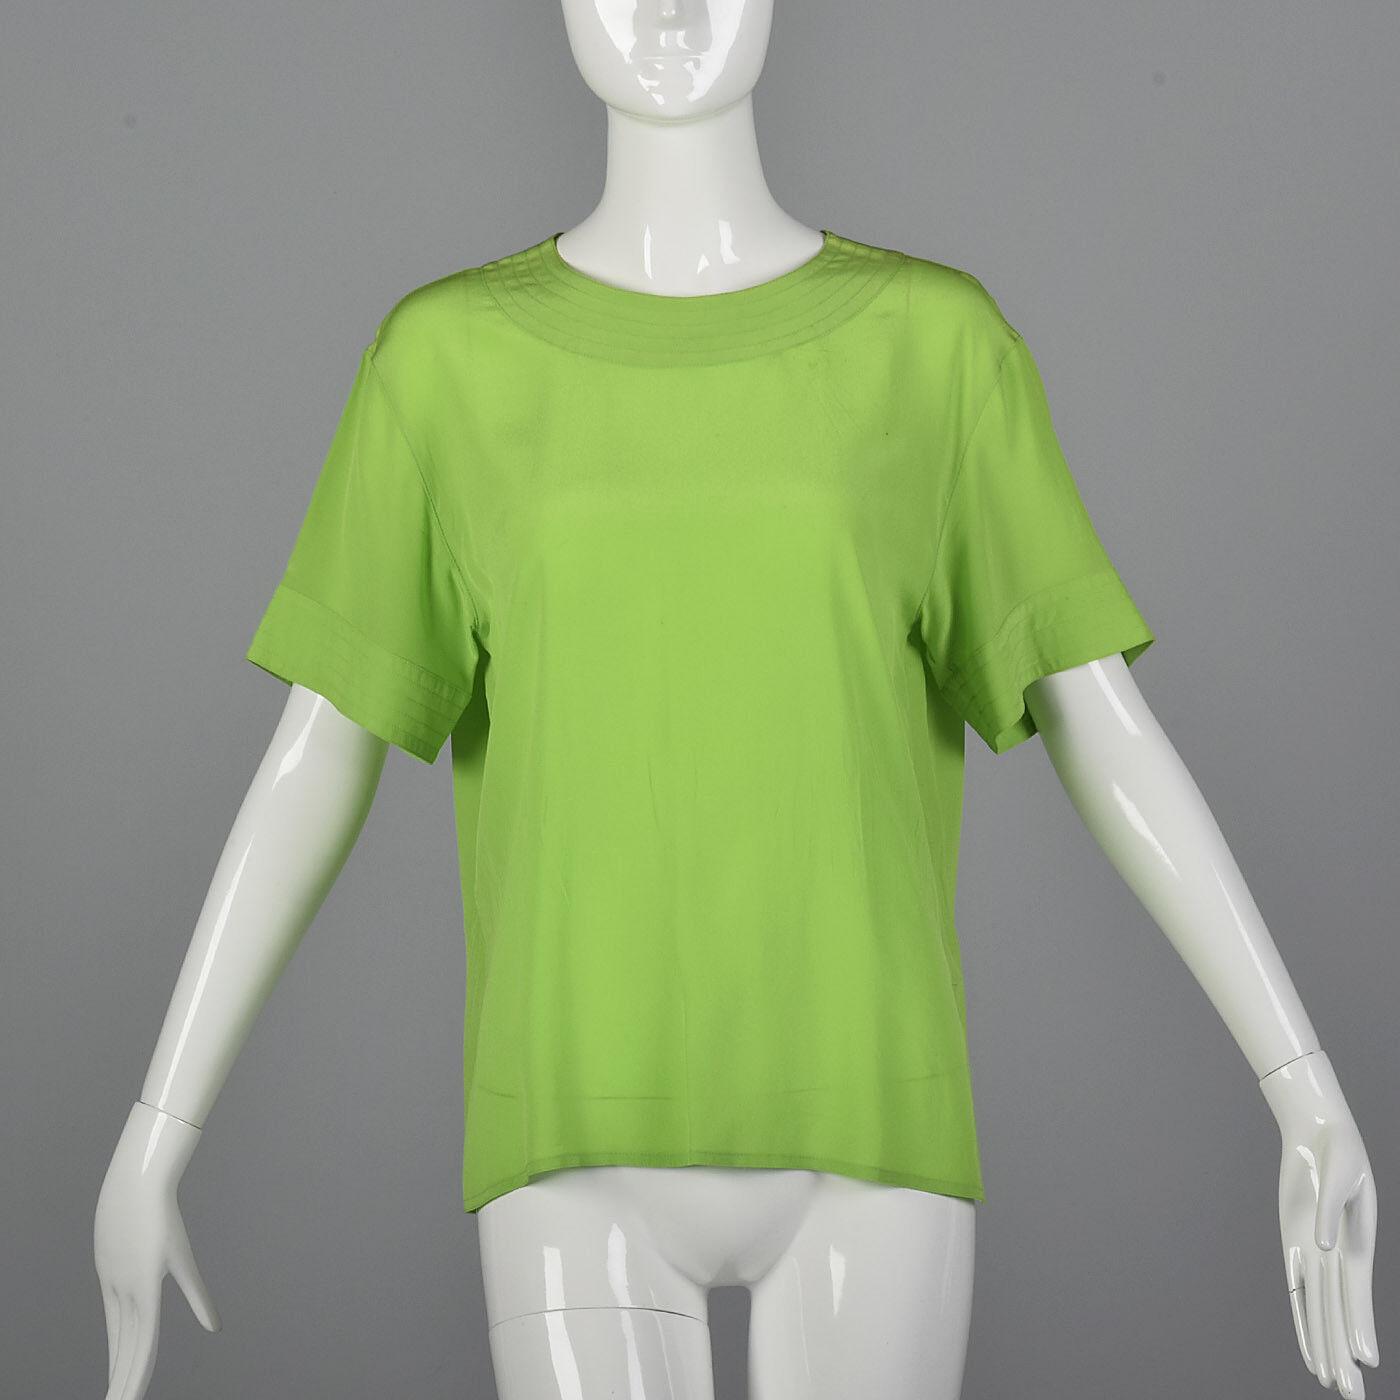 M 1990s Max Mara Green Silk Top Short Sleeve Blouse Lightweight Spring 90s VTG